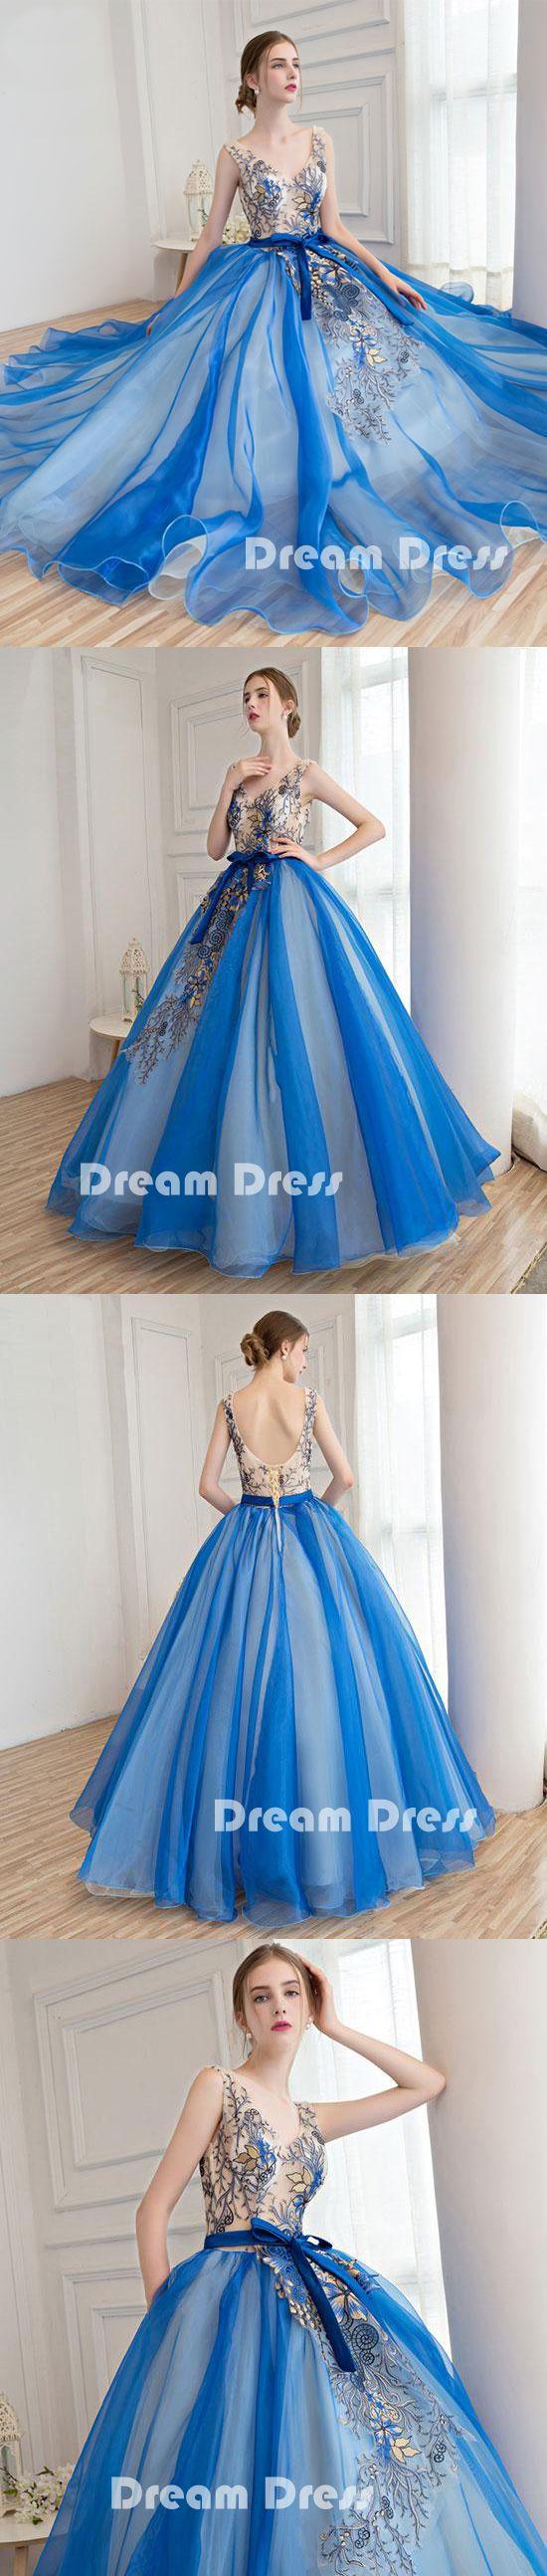 Royal blue tulle applique long prom dresses blue evening dresses